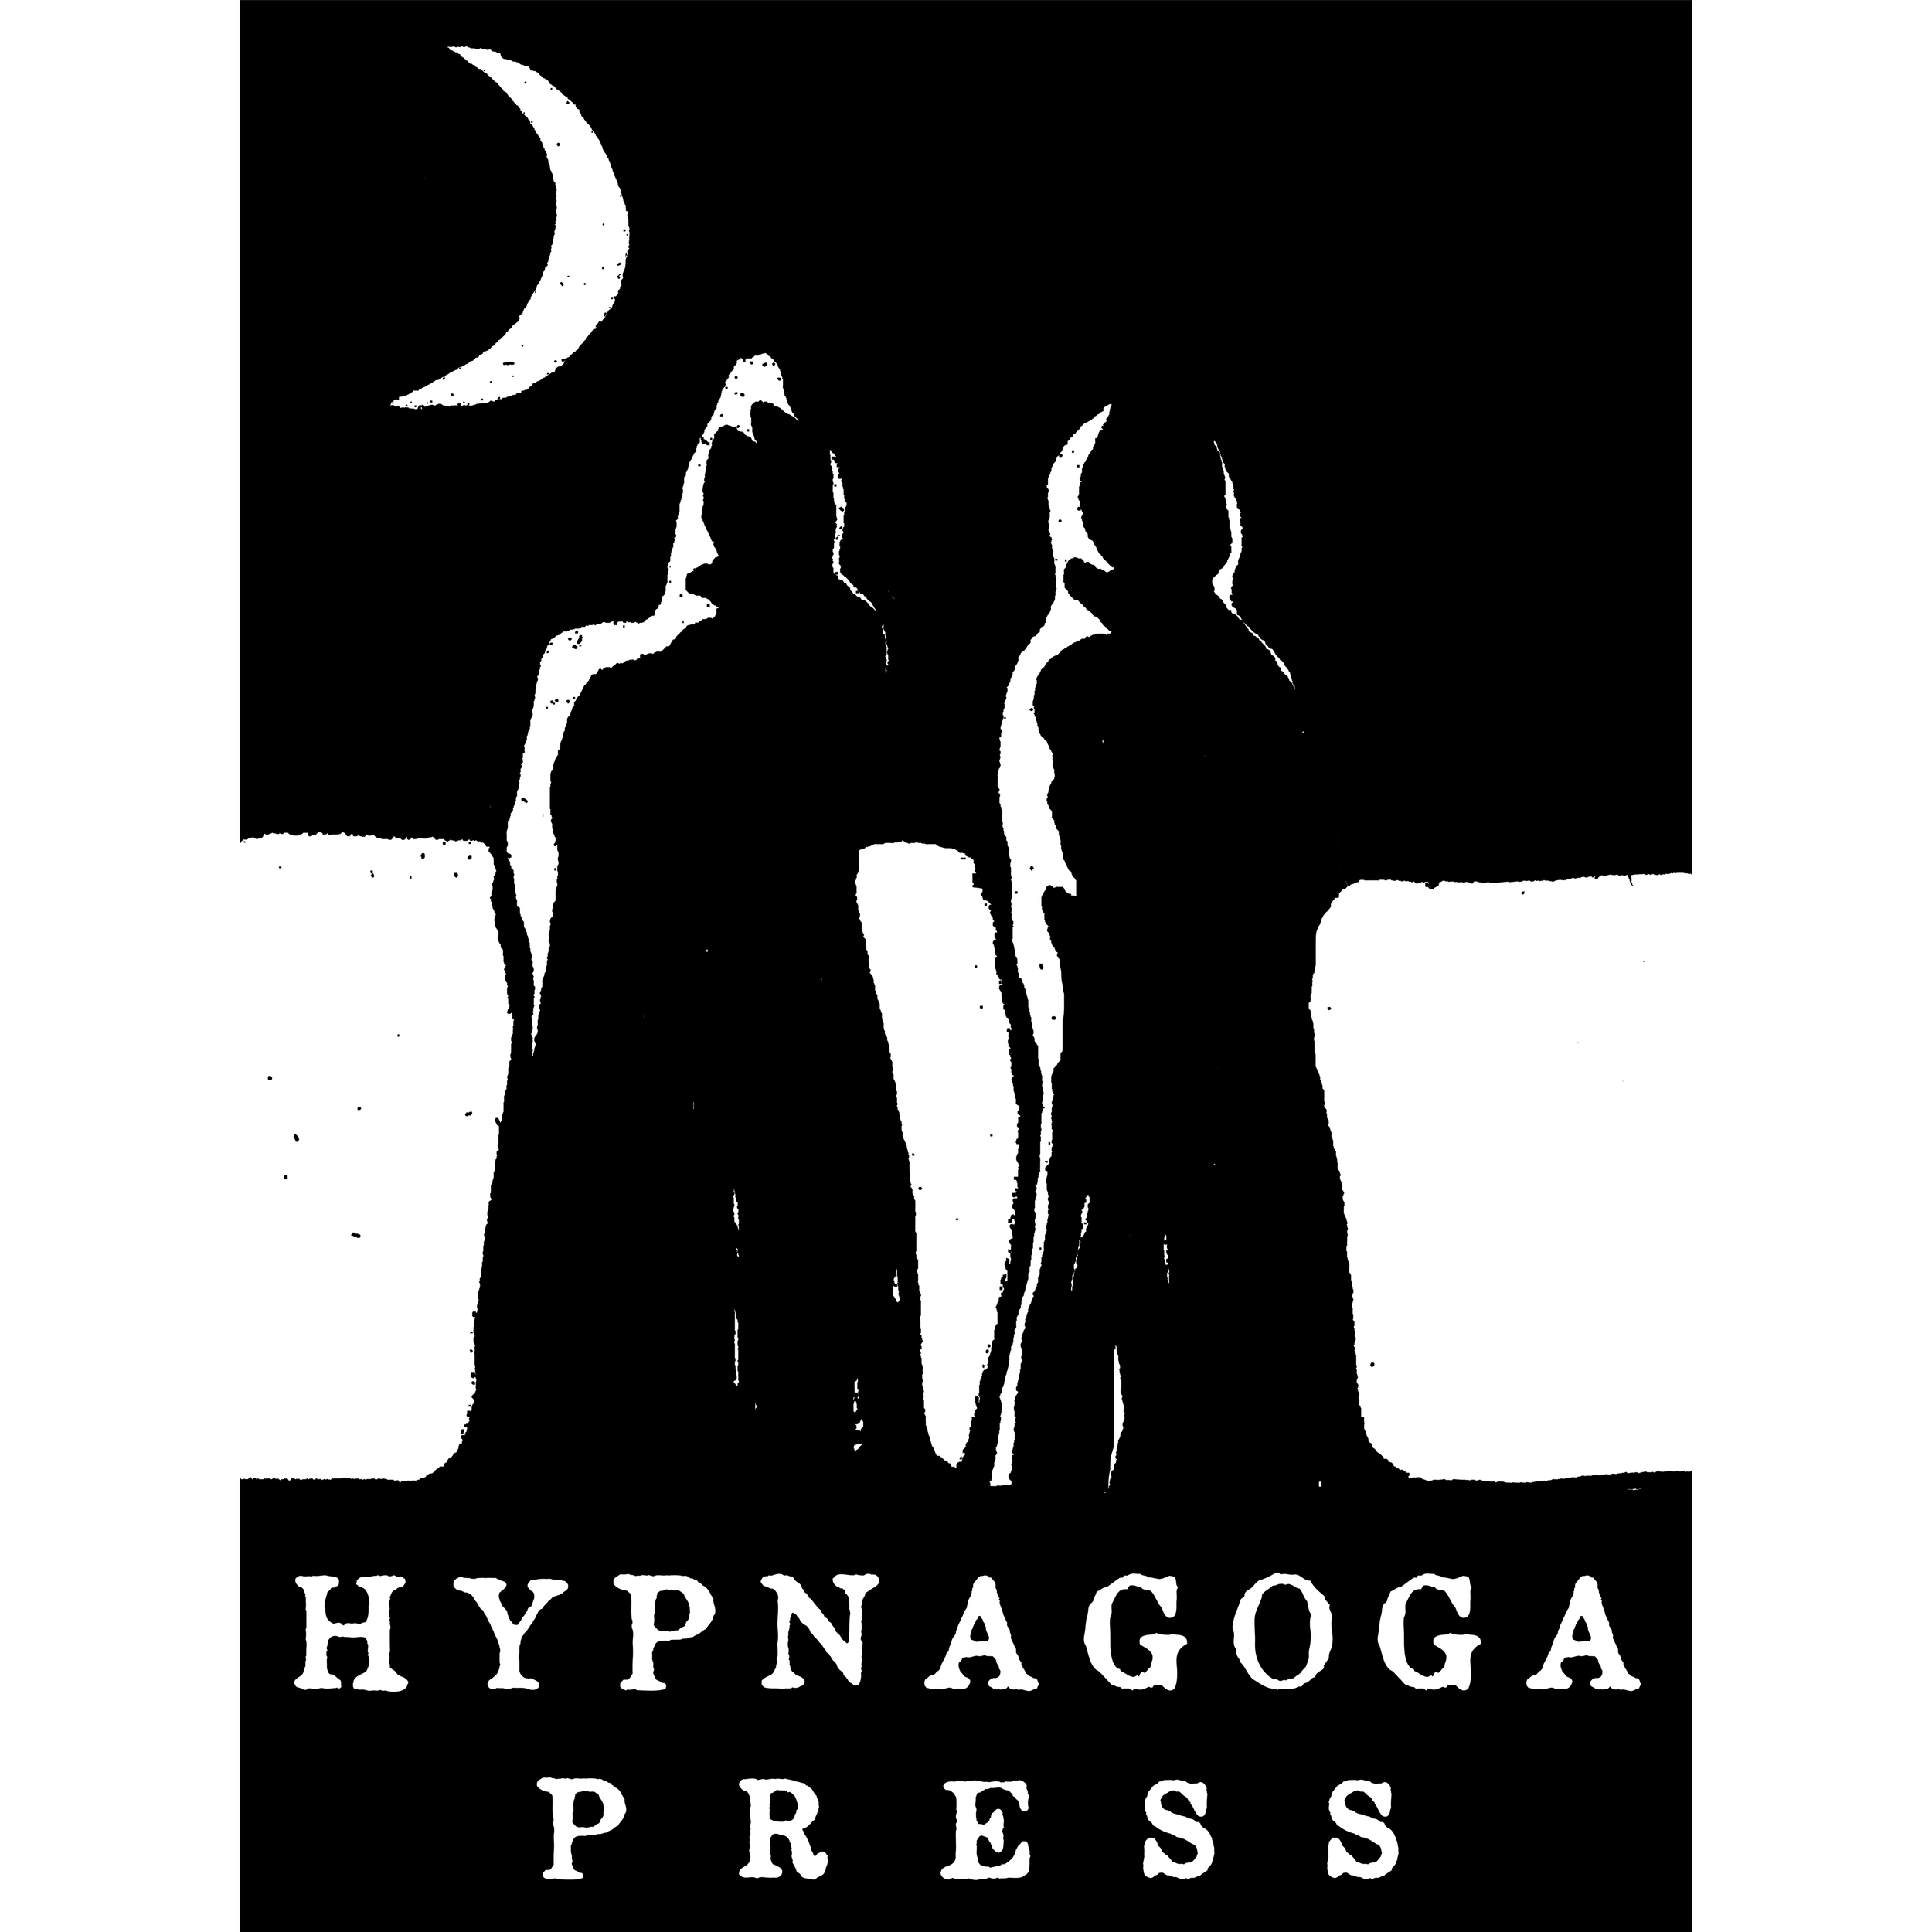 Hypnagoga Press